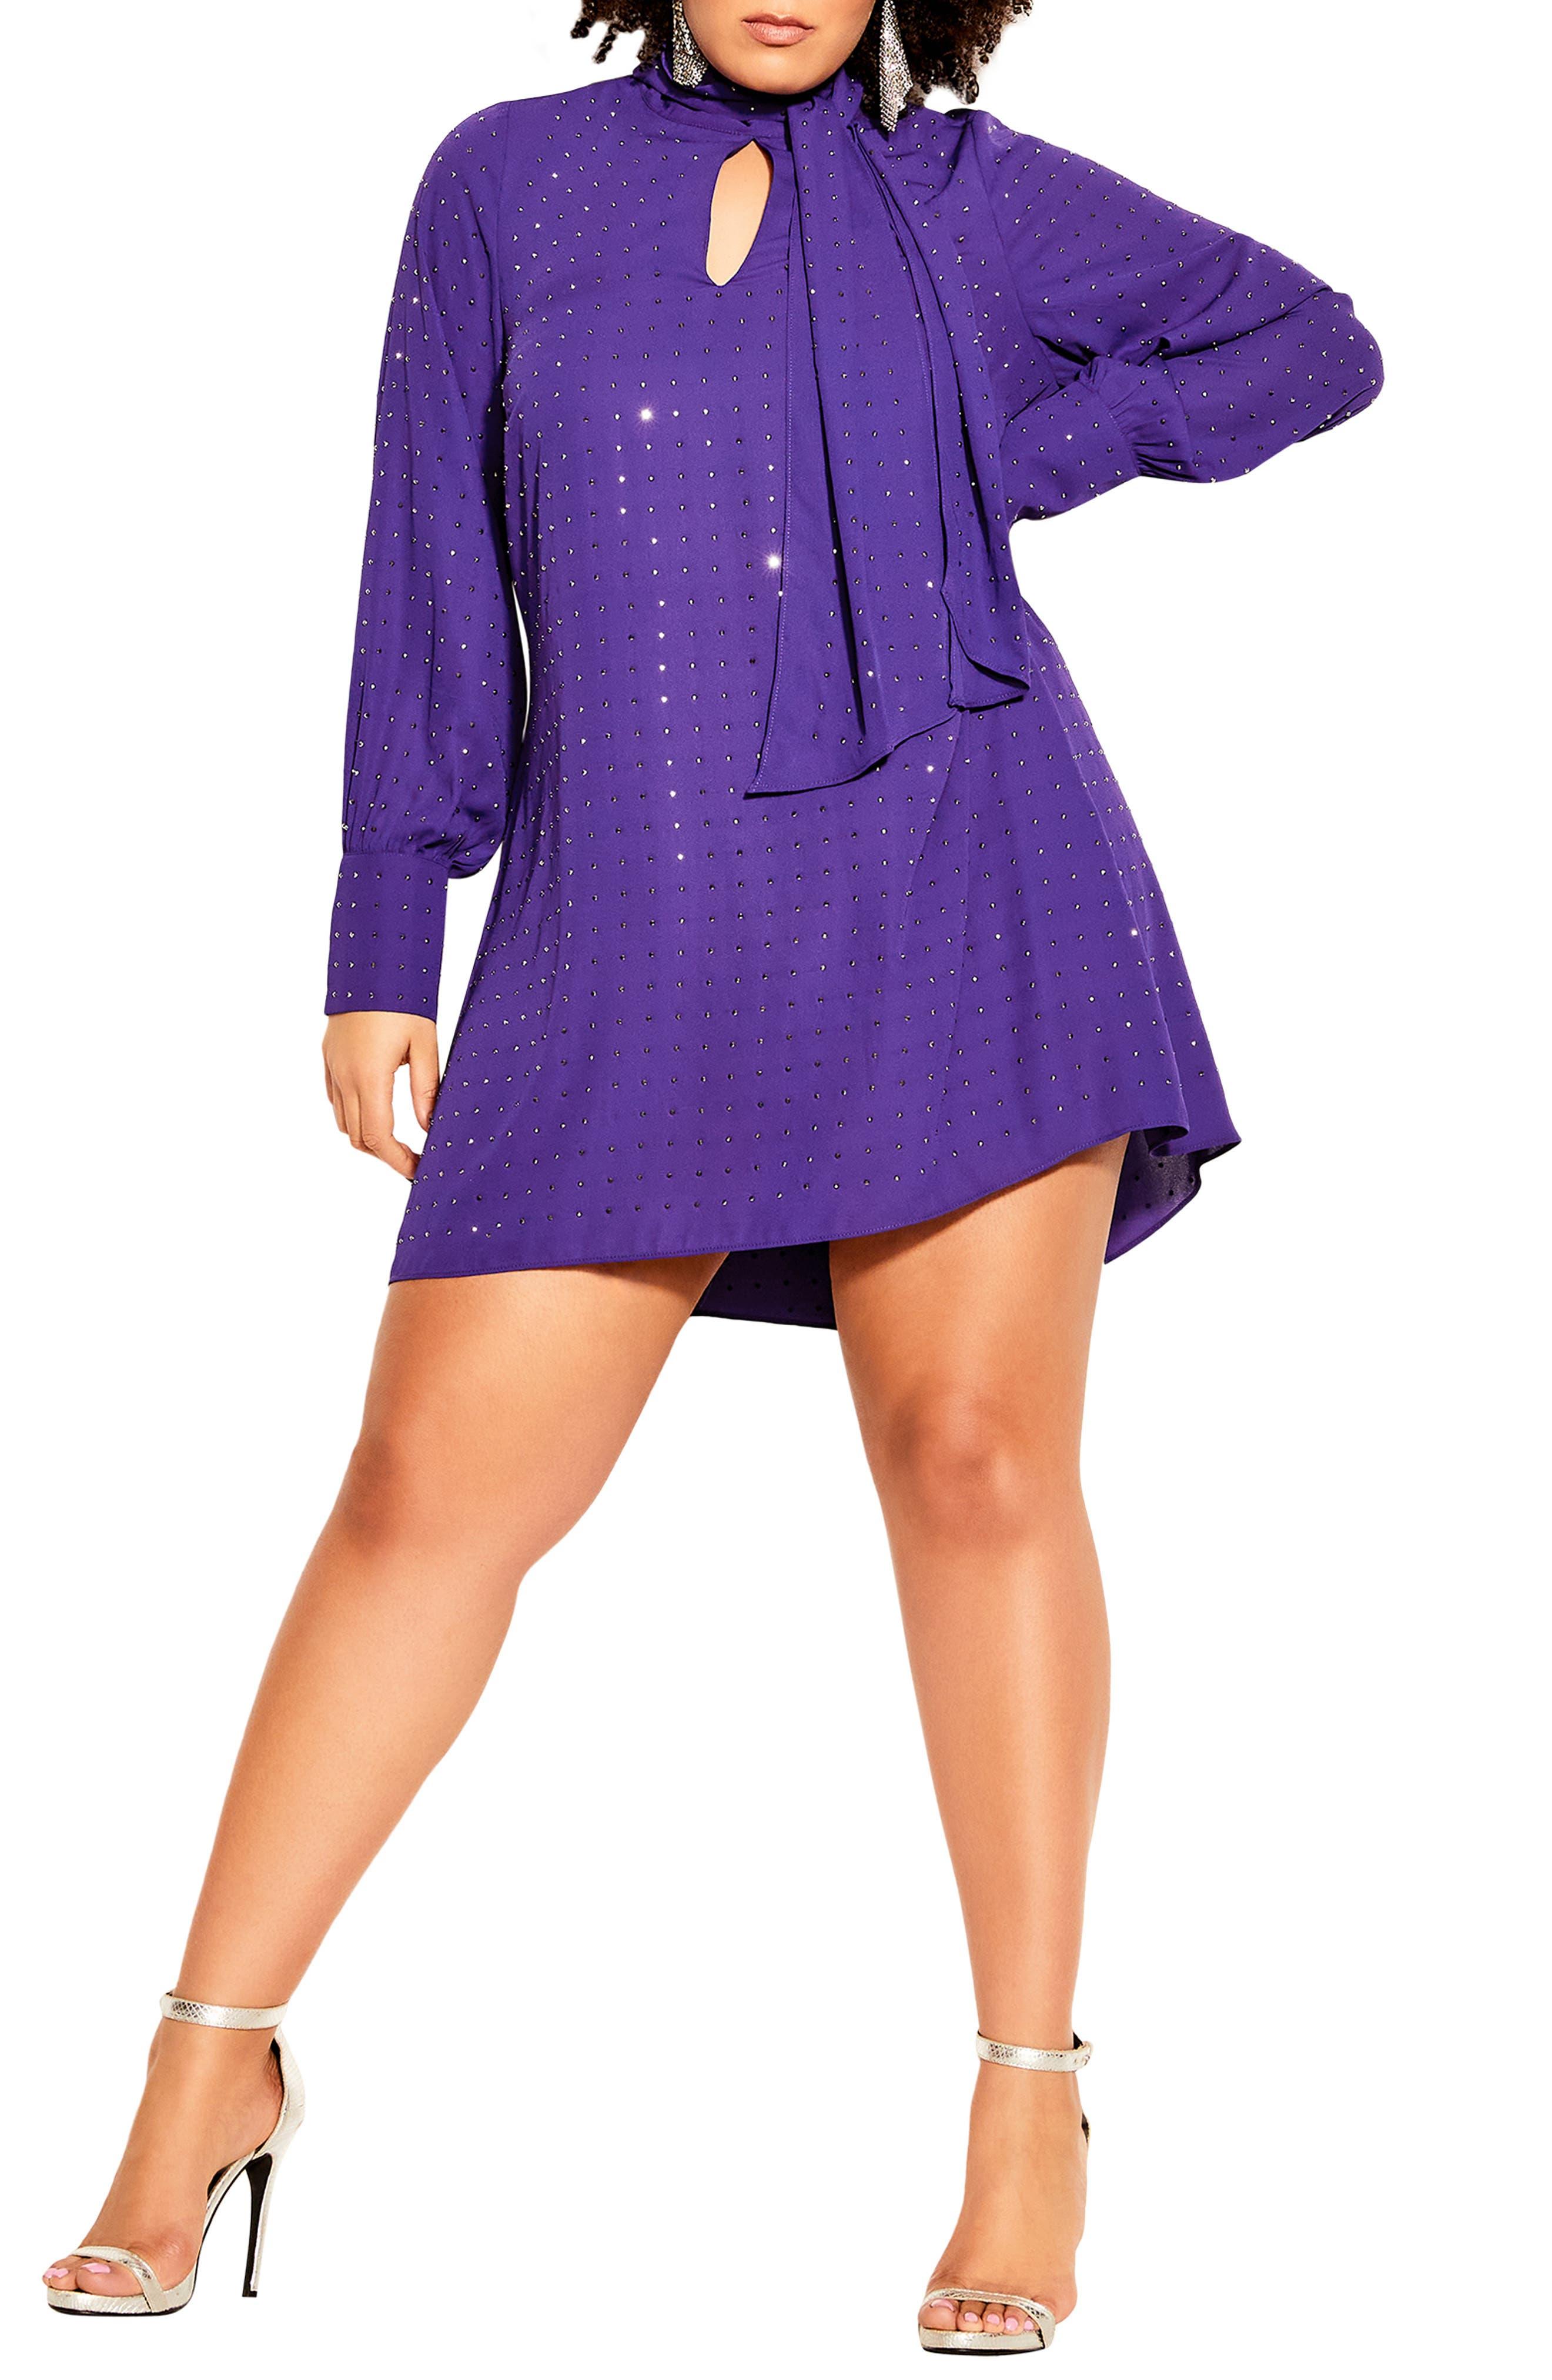 60s 70s Plus Size Dresses, Clothing, Costumes Plus Size Womens City Chic Nailhead Studded Long Sleeve Tunic Dress Size XX-Large - Purple $99.00 AT vintagedancer.com